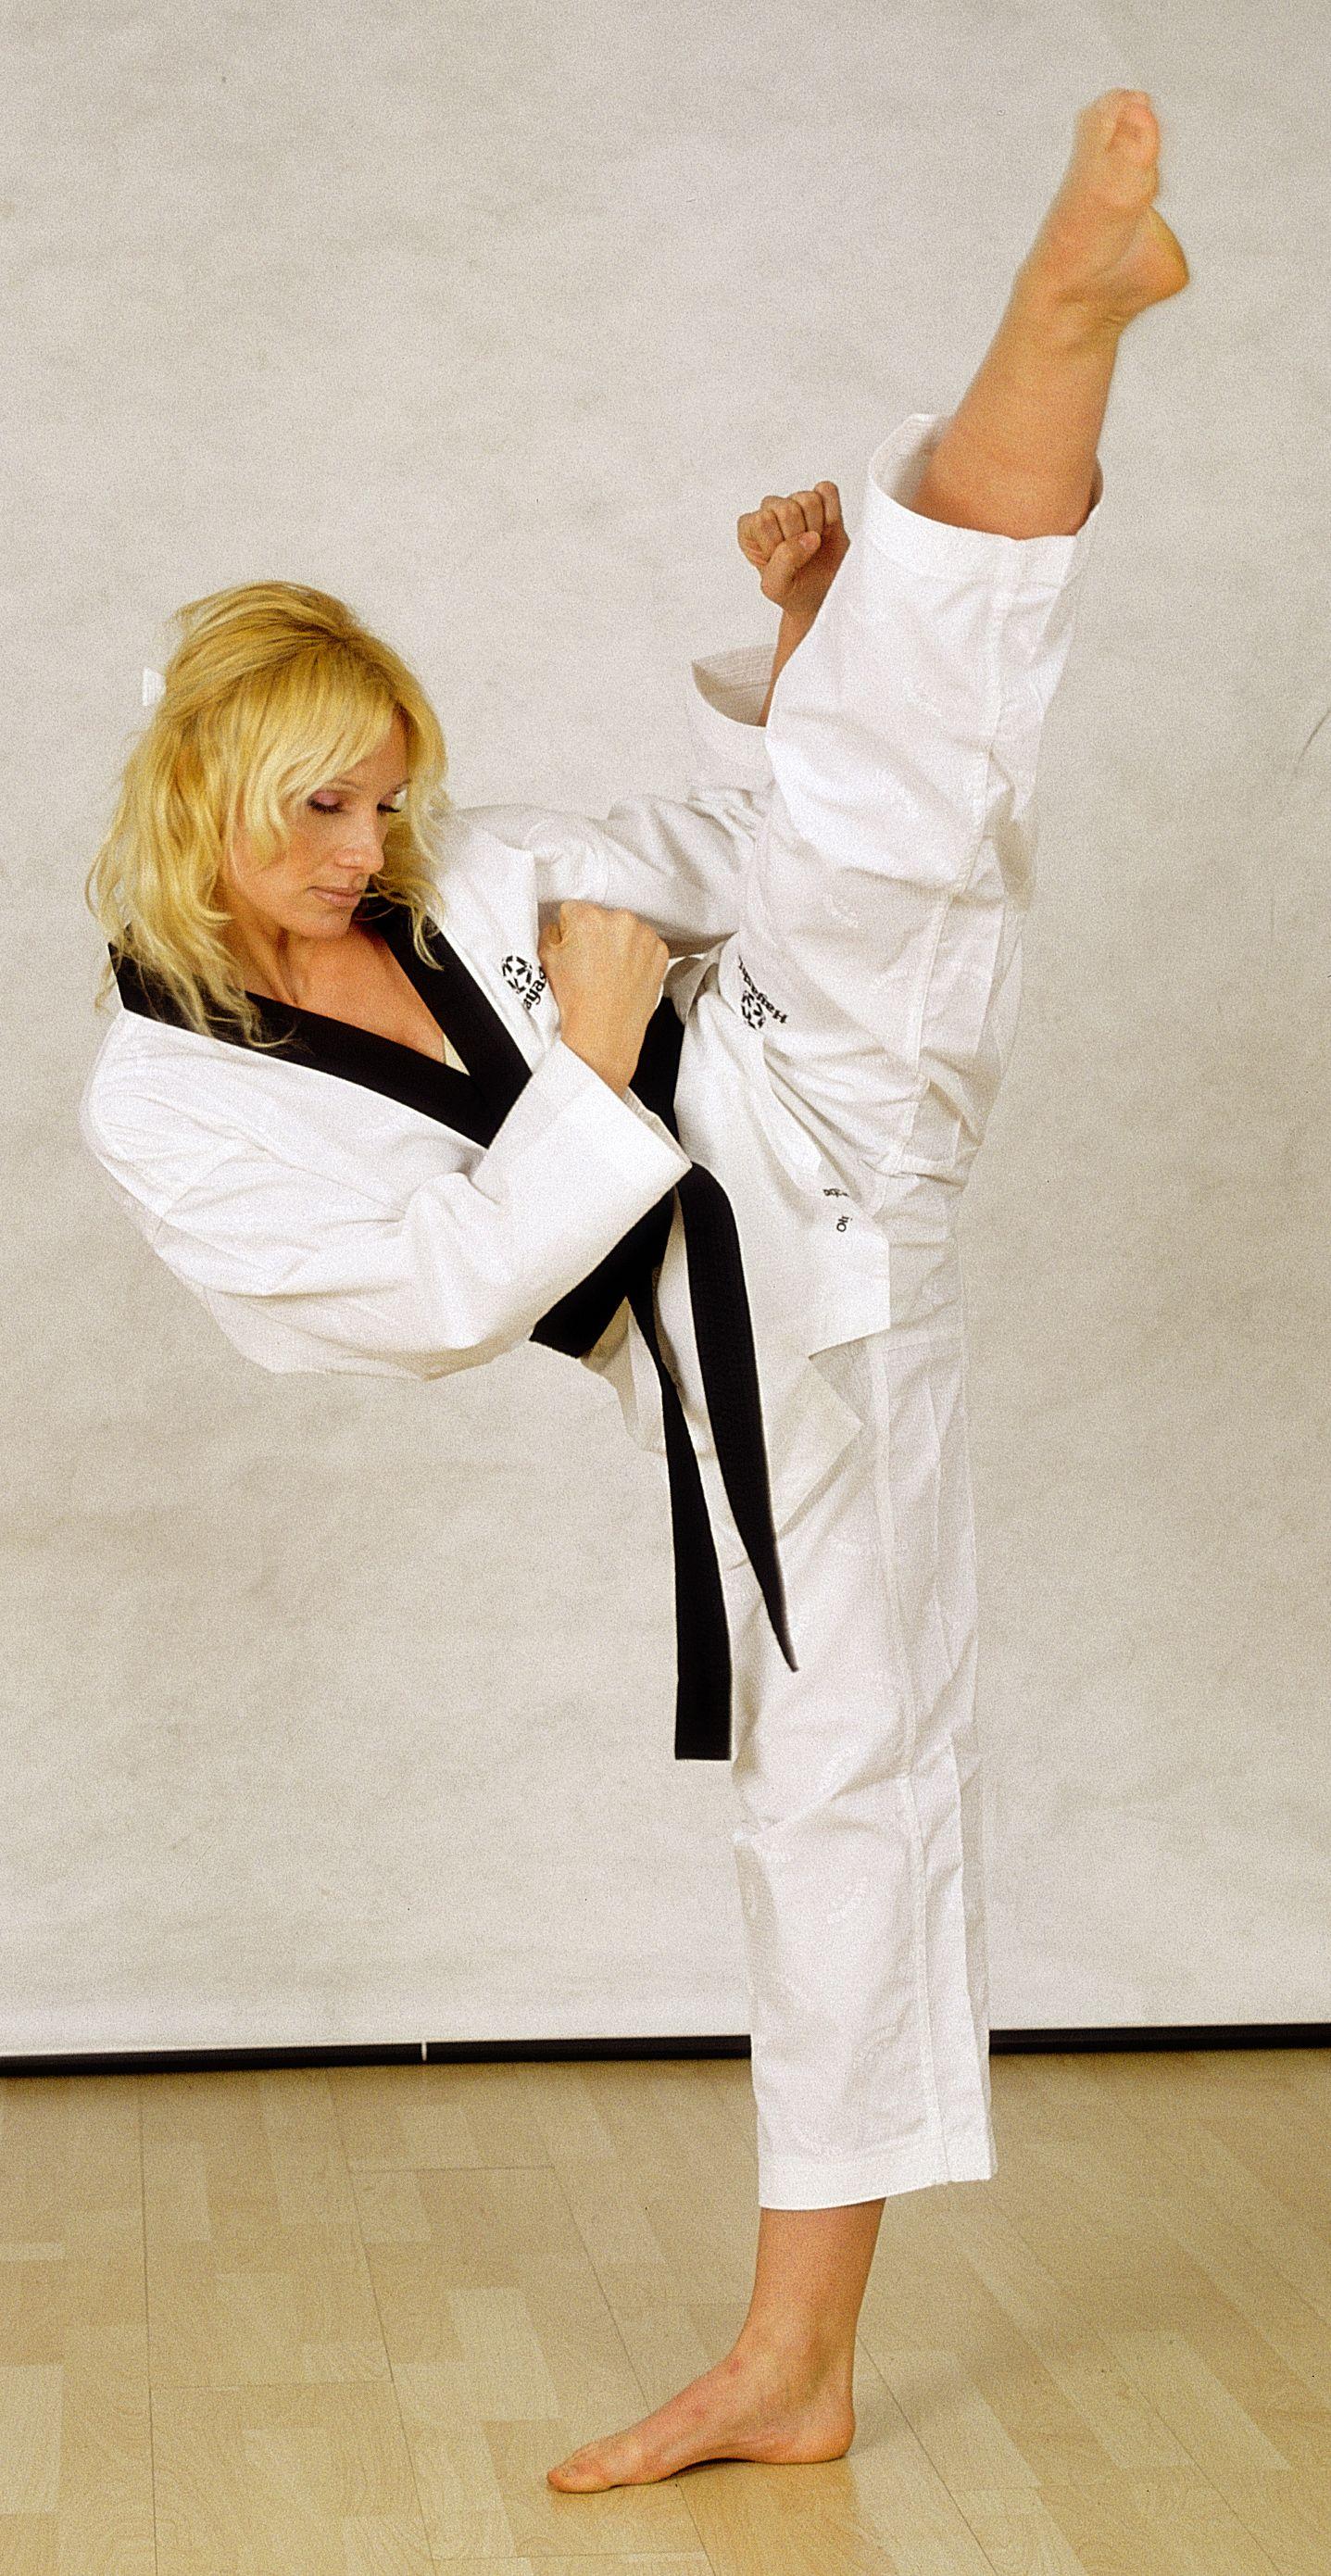 Portrait Of Mature Woman Wearing Martial Arts Uniform